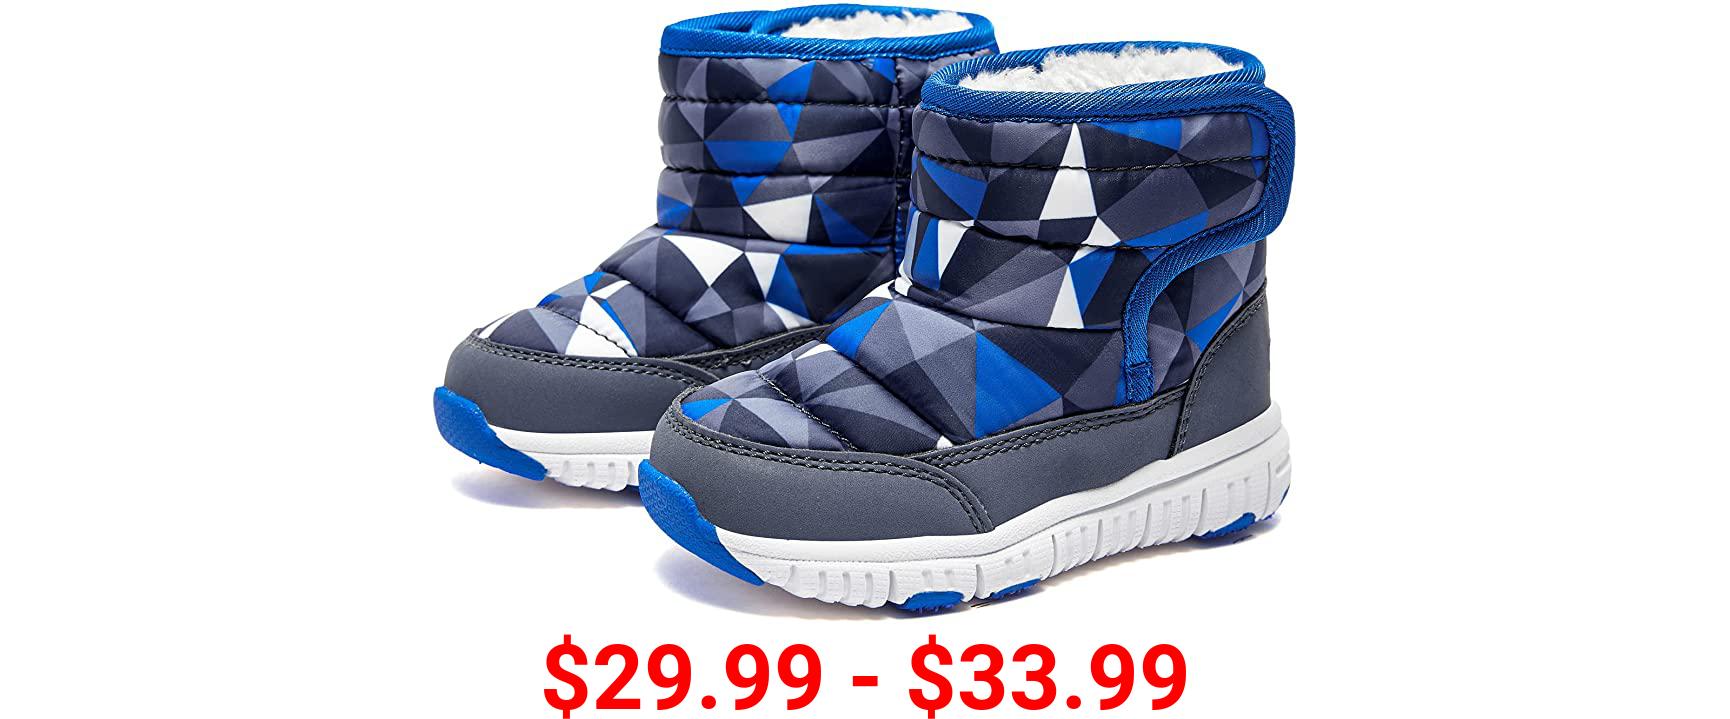 HOBIBEAR Boys Girls Toddler Snow Boots Waterproof Slip Resistant Outdoor Winter Shoes(Toddler/Little Kids/Big Kids)